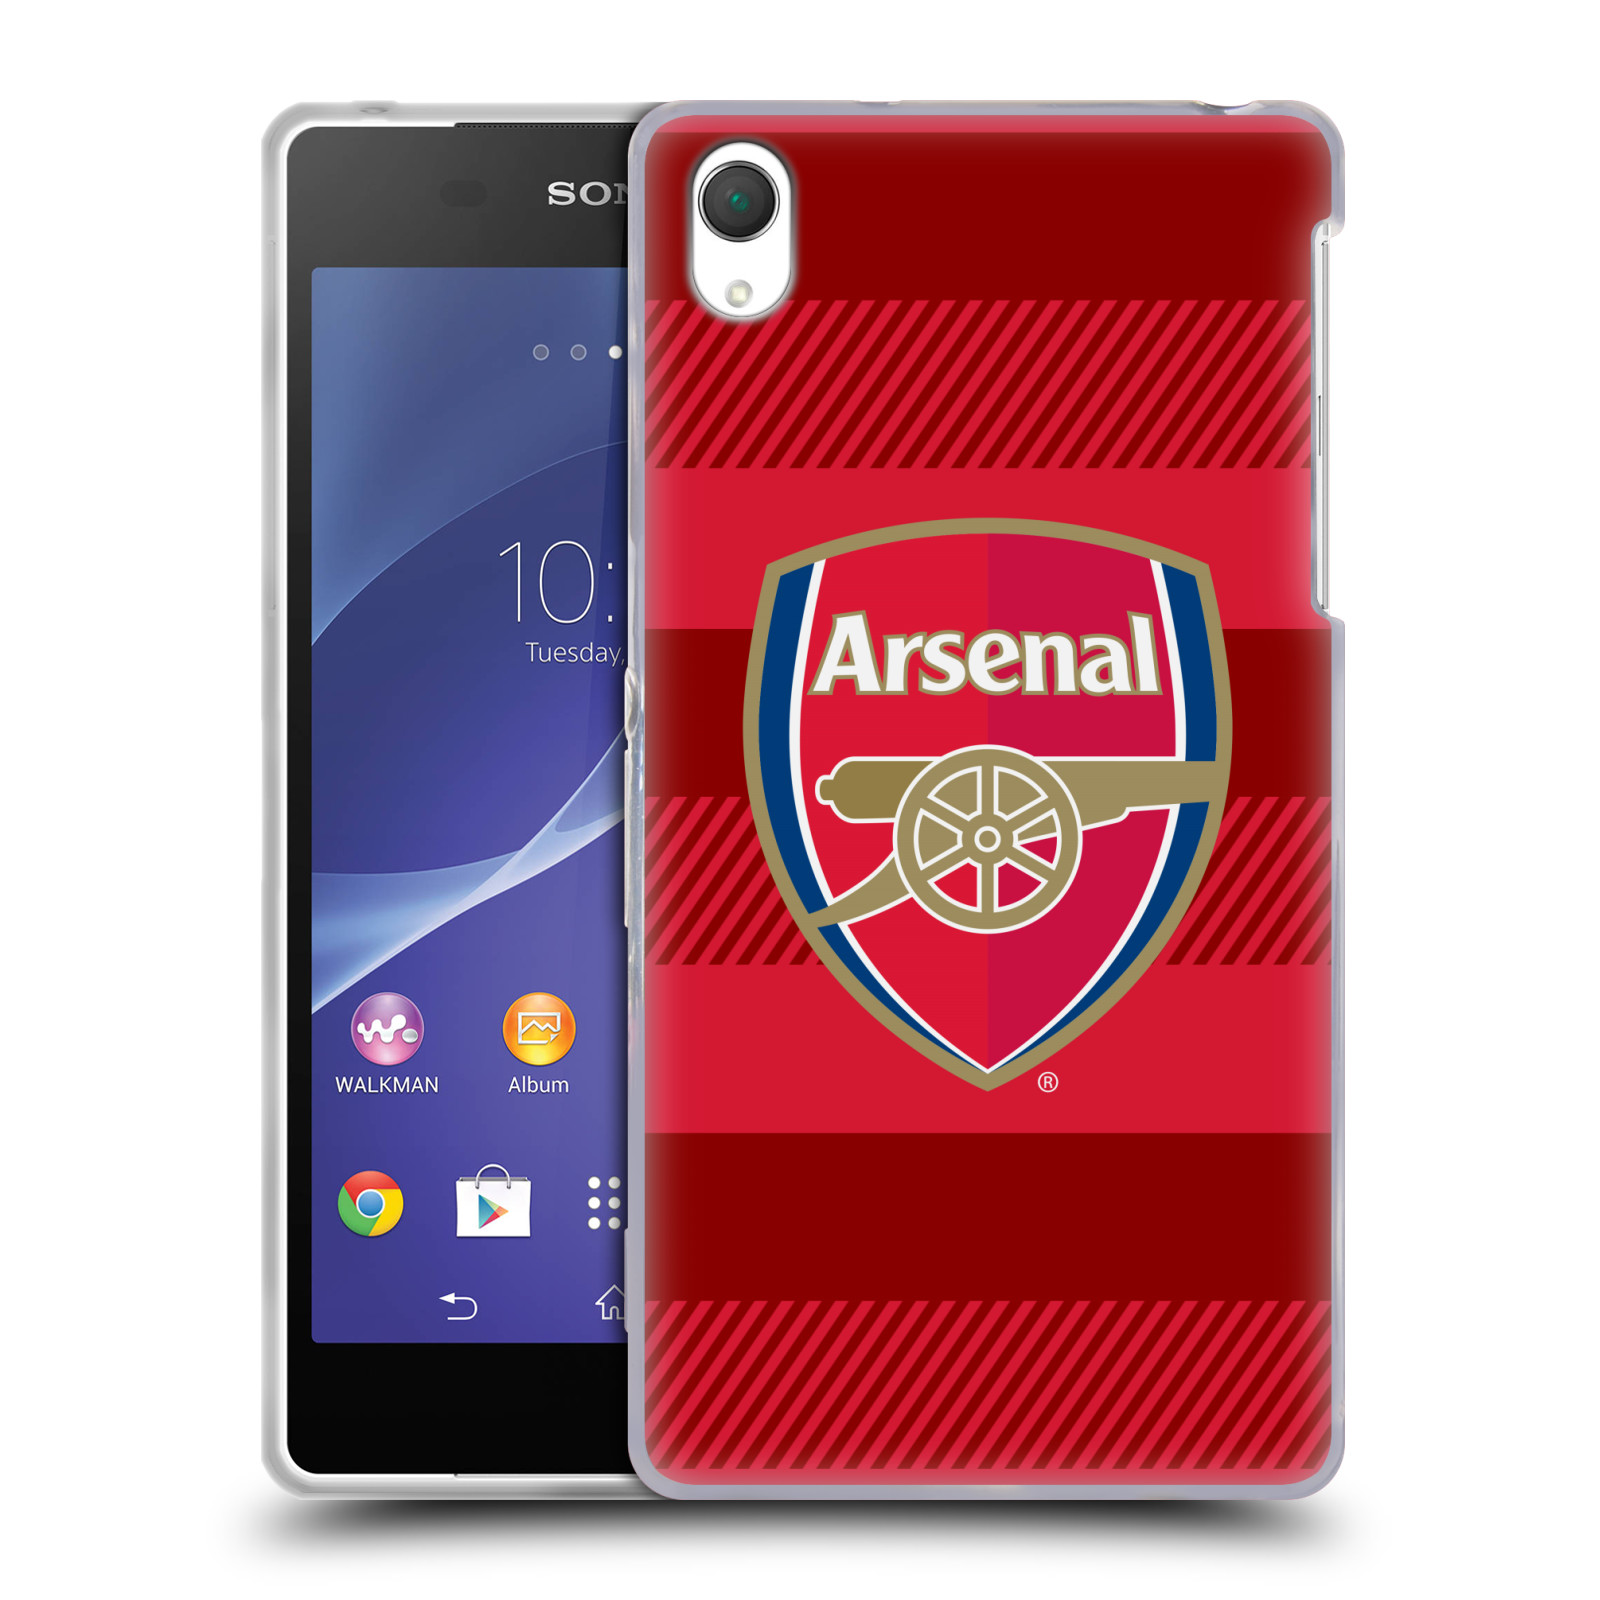 Silikonové pouzdro na mobil Sony Xperia Z2 D6503 - Head Case - Arsenal FC - Logo s pruhy